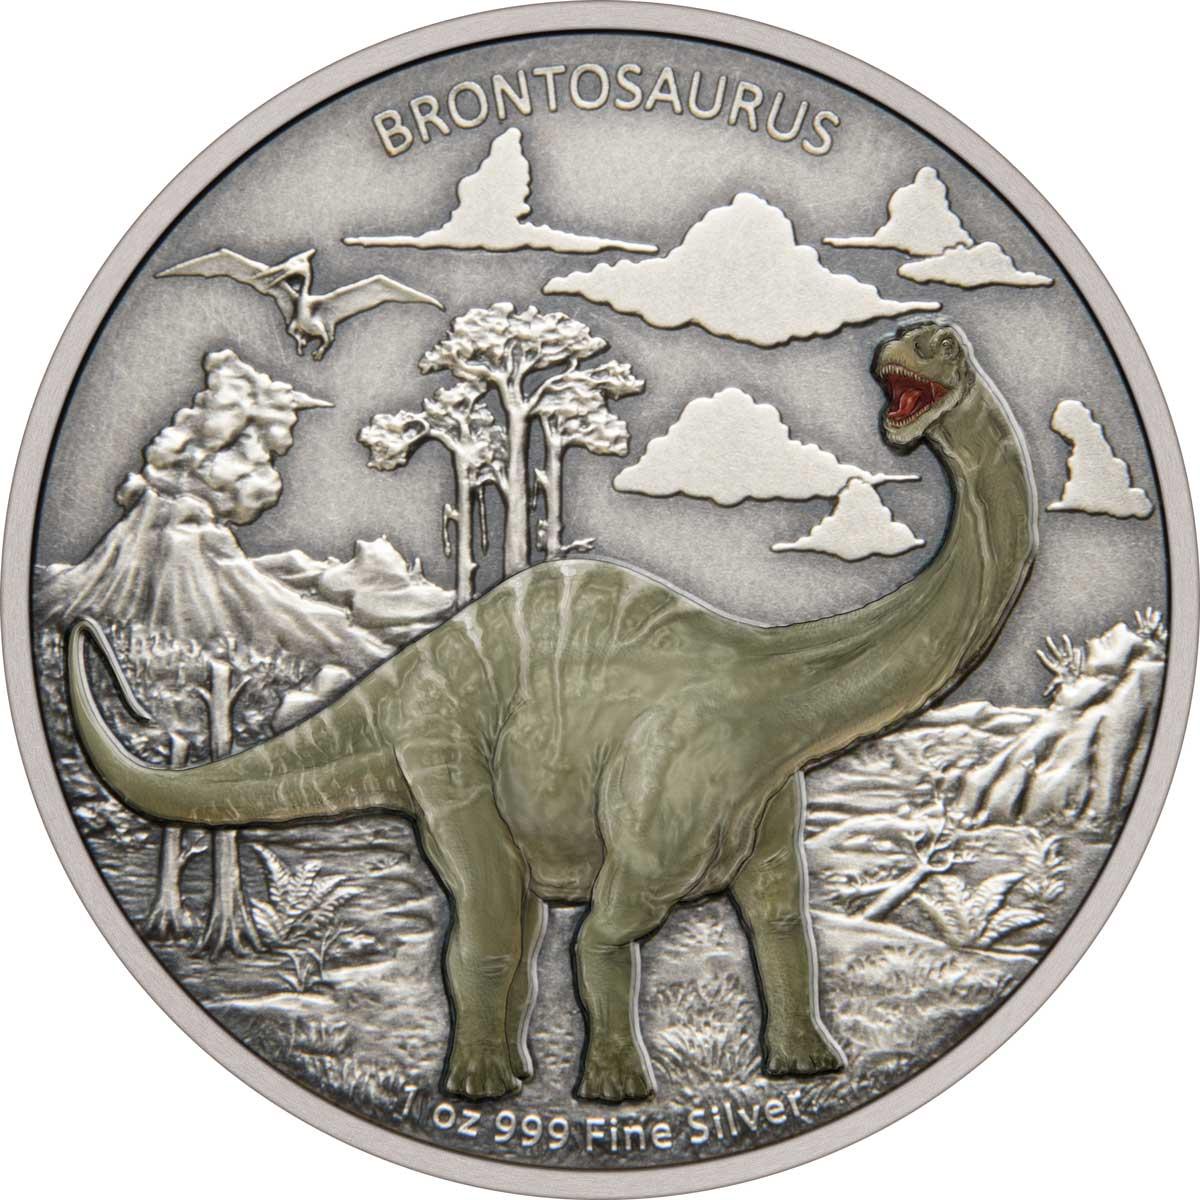 Ниуэ монета 2 доллара Бронтозавр, реверс